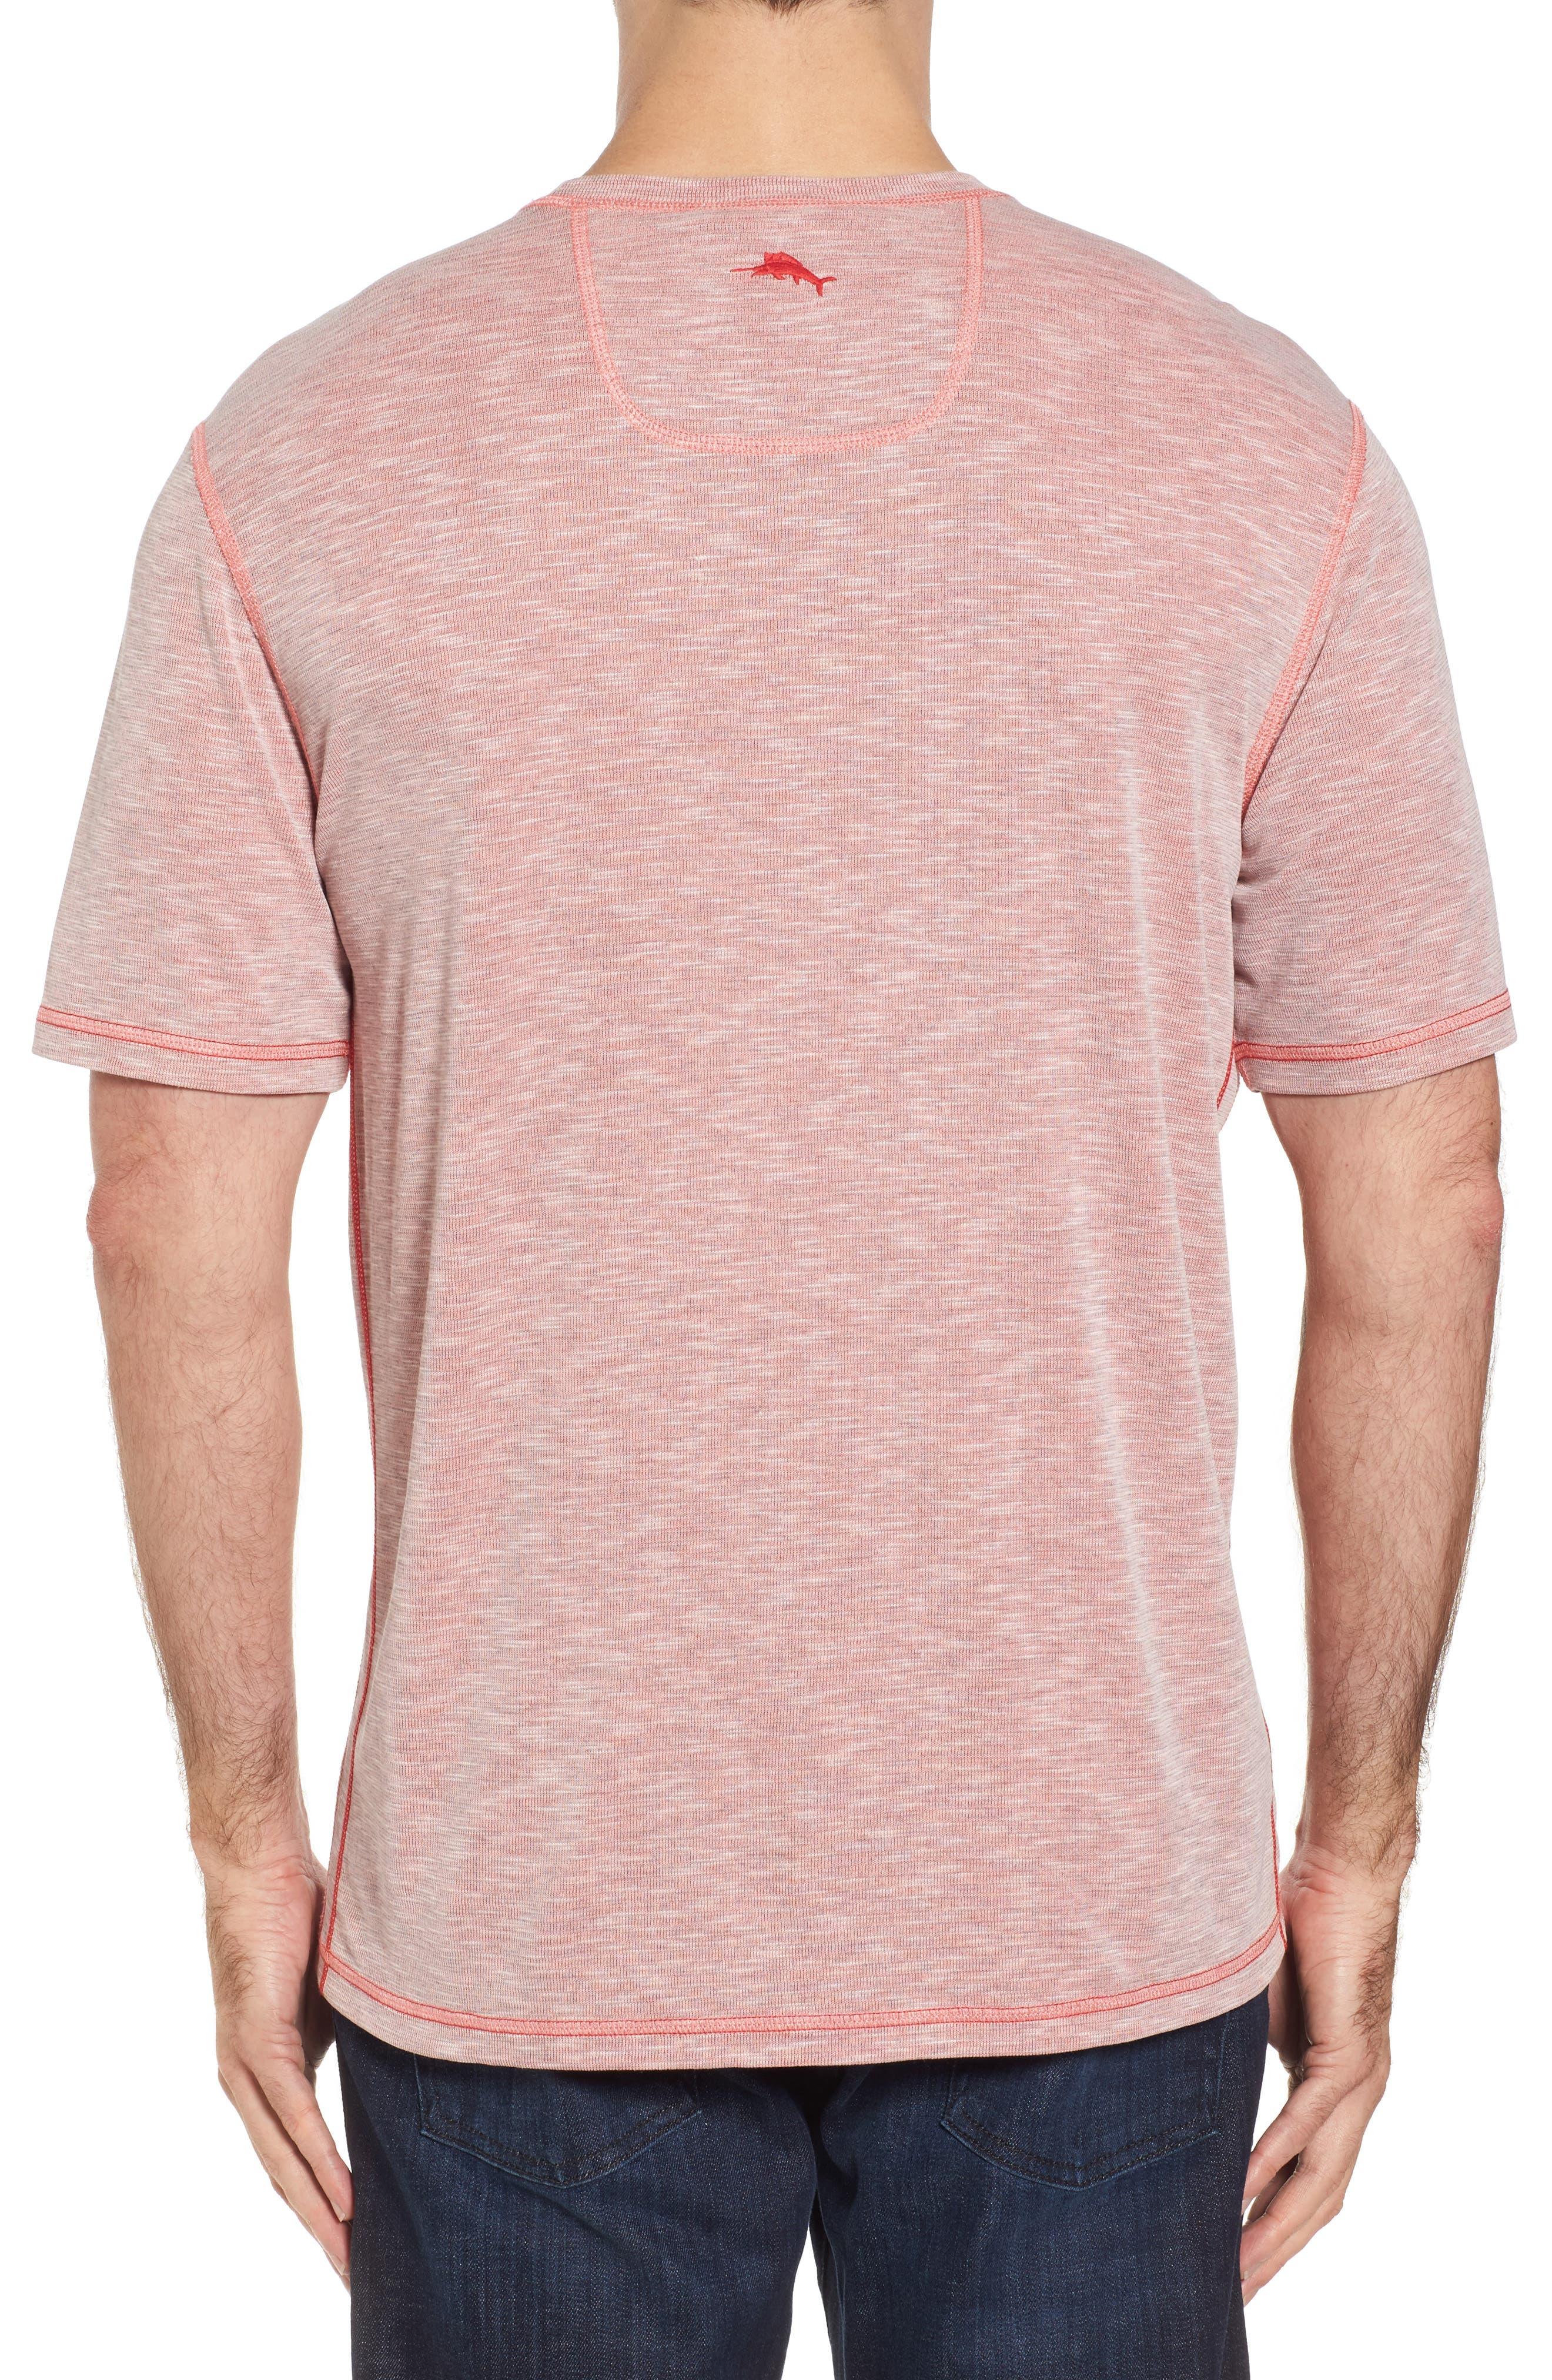 Flip Tide T-Shirt,                             Alternate thumbnail 2, color,                             Red Cherry